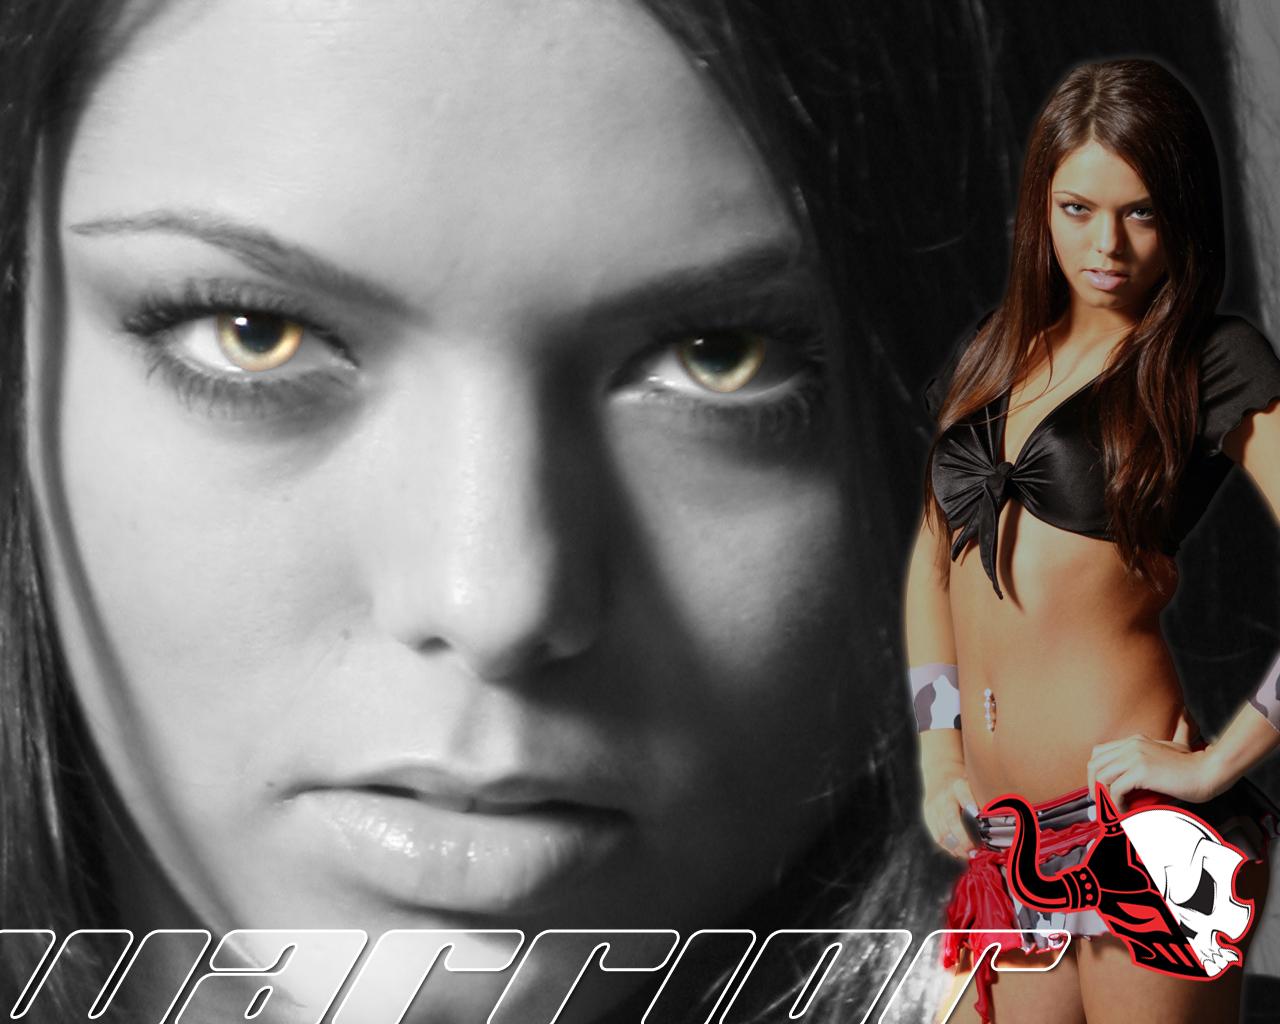 UFC Wallpaper Pictures 1280x1024